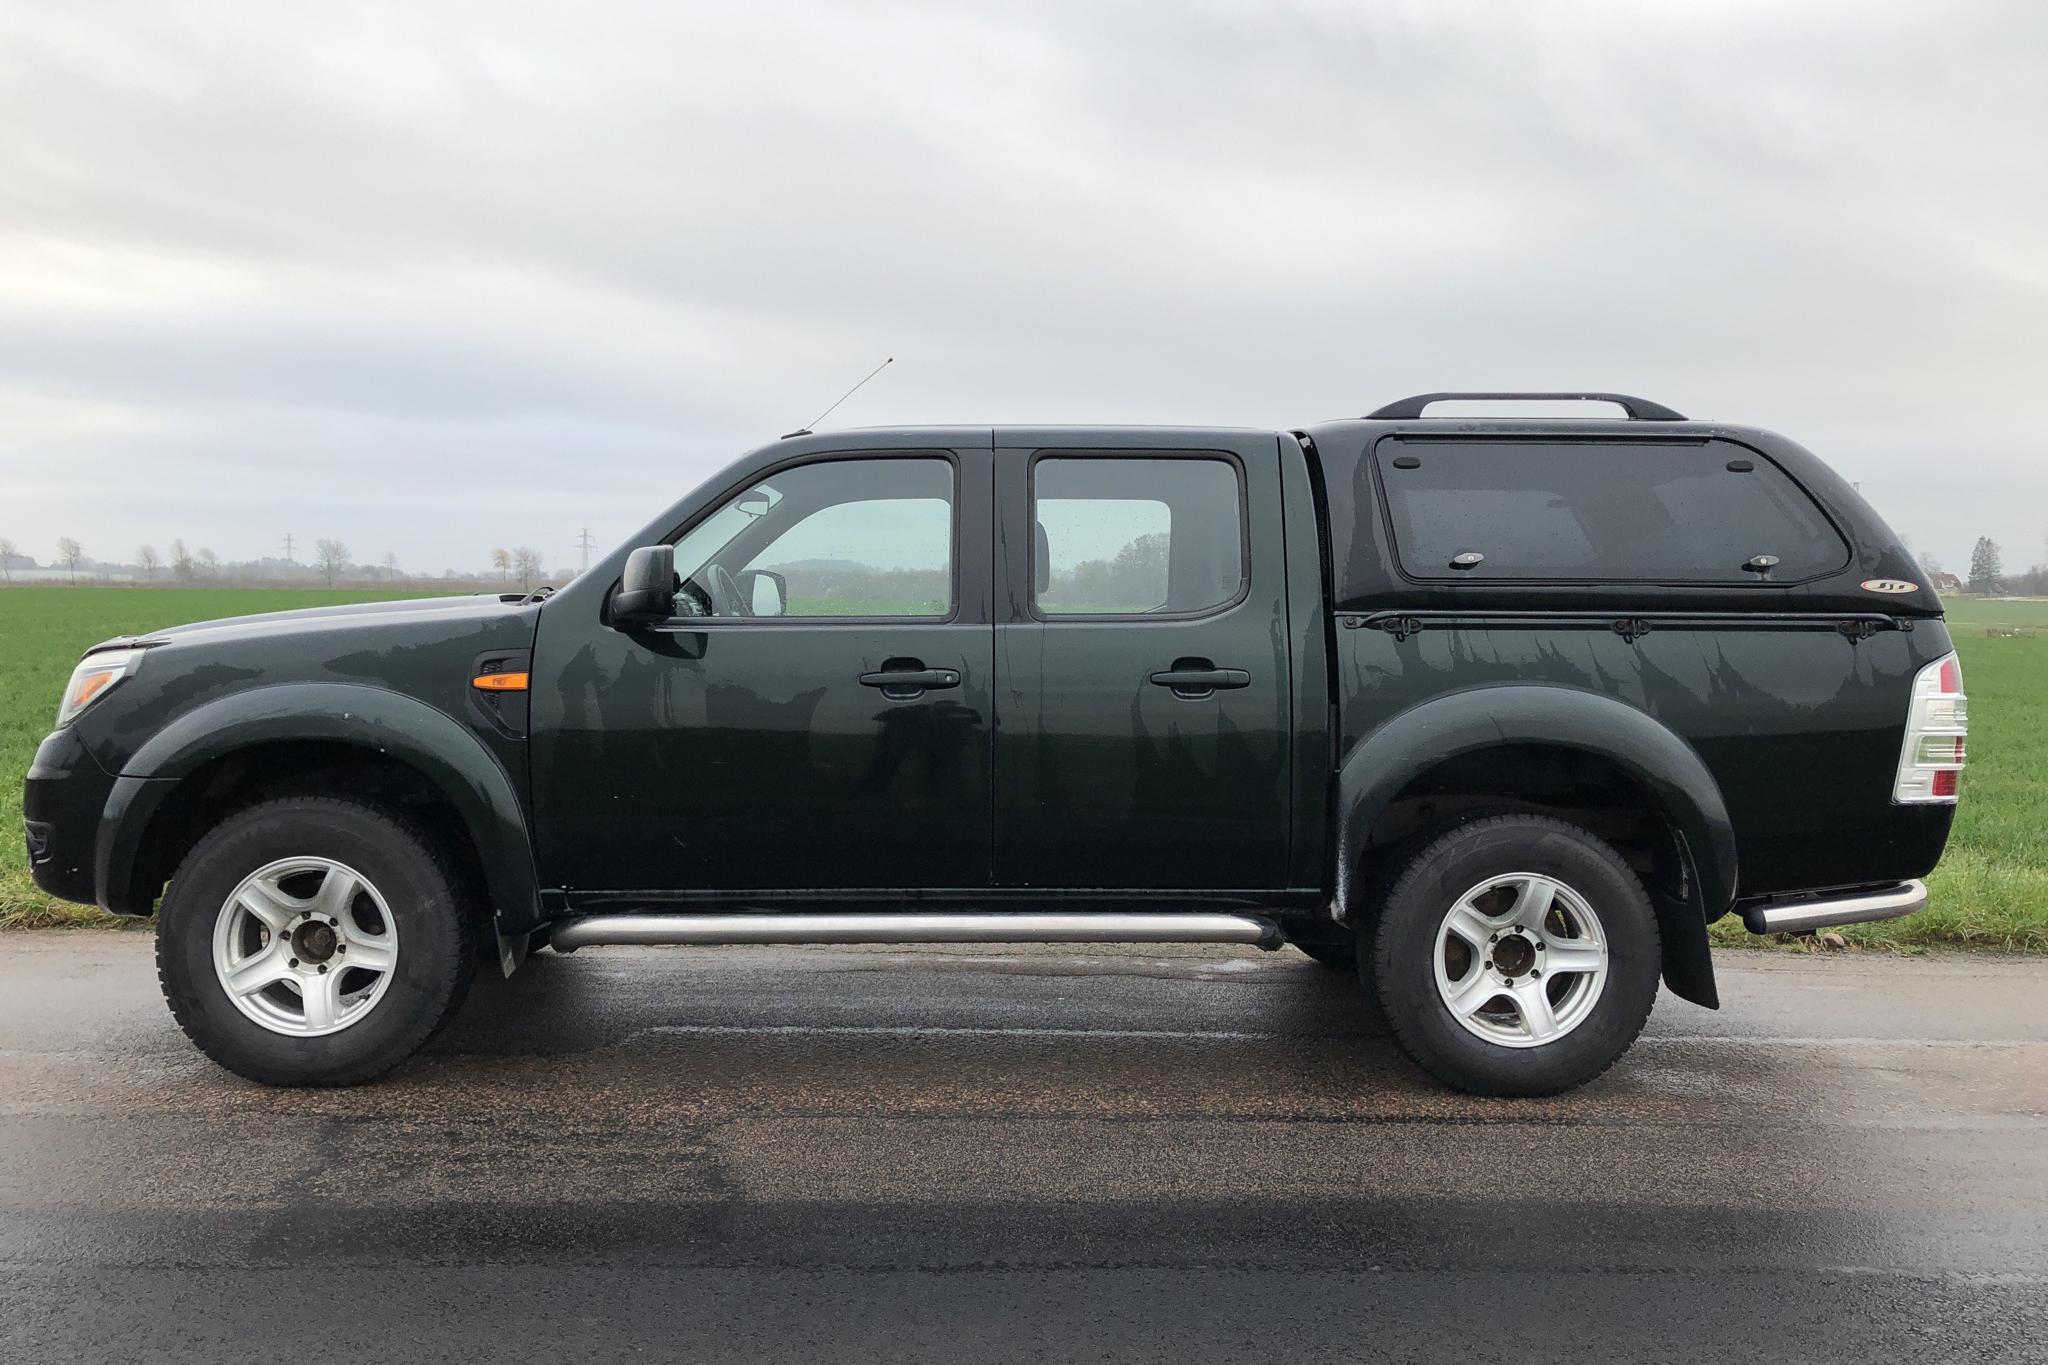 Ford Ranger 2.5 TDCi 4WD (143hk) - 17 118 mil - Manuell - grön - 2011